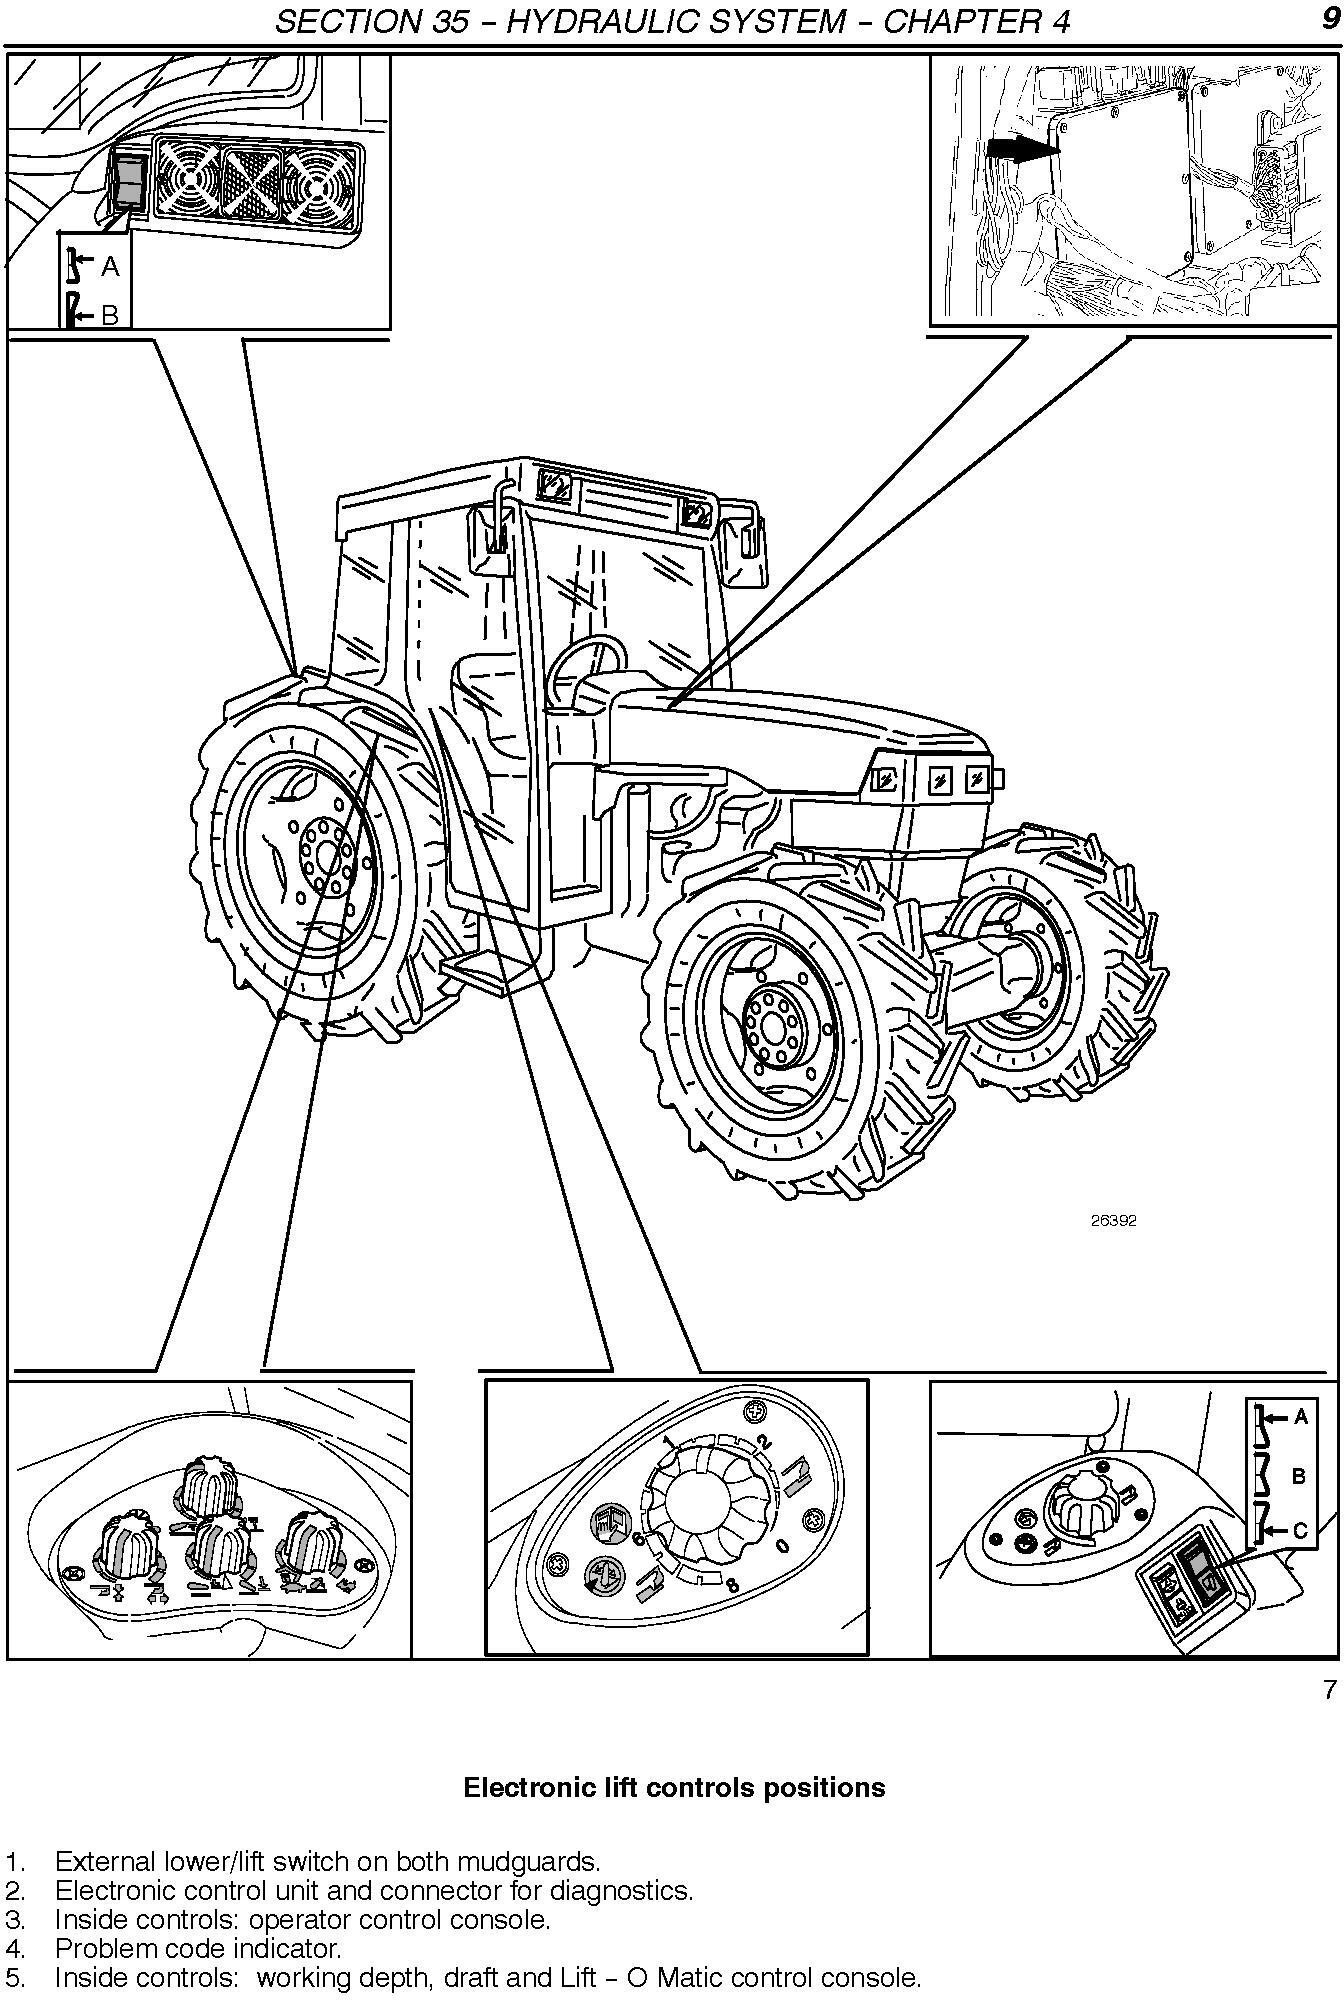 New Holland TN65F, TN70F, TN75F, TN80F, TN90F, TN95F Tractor Service Manual - 1